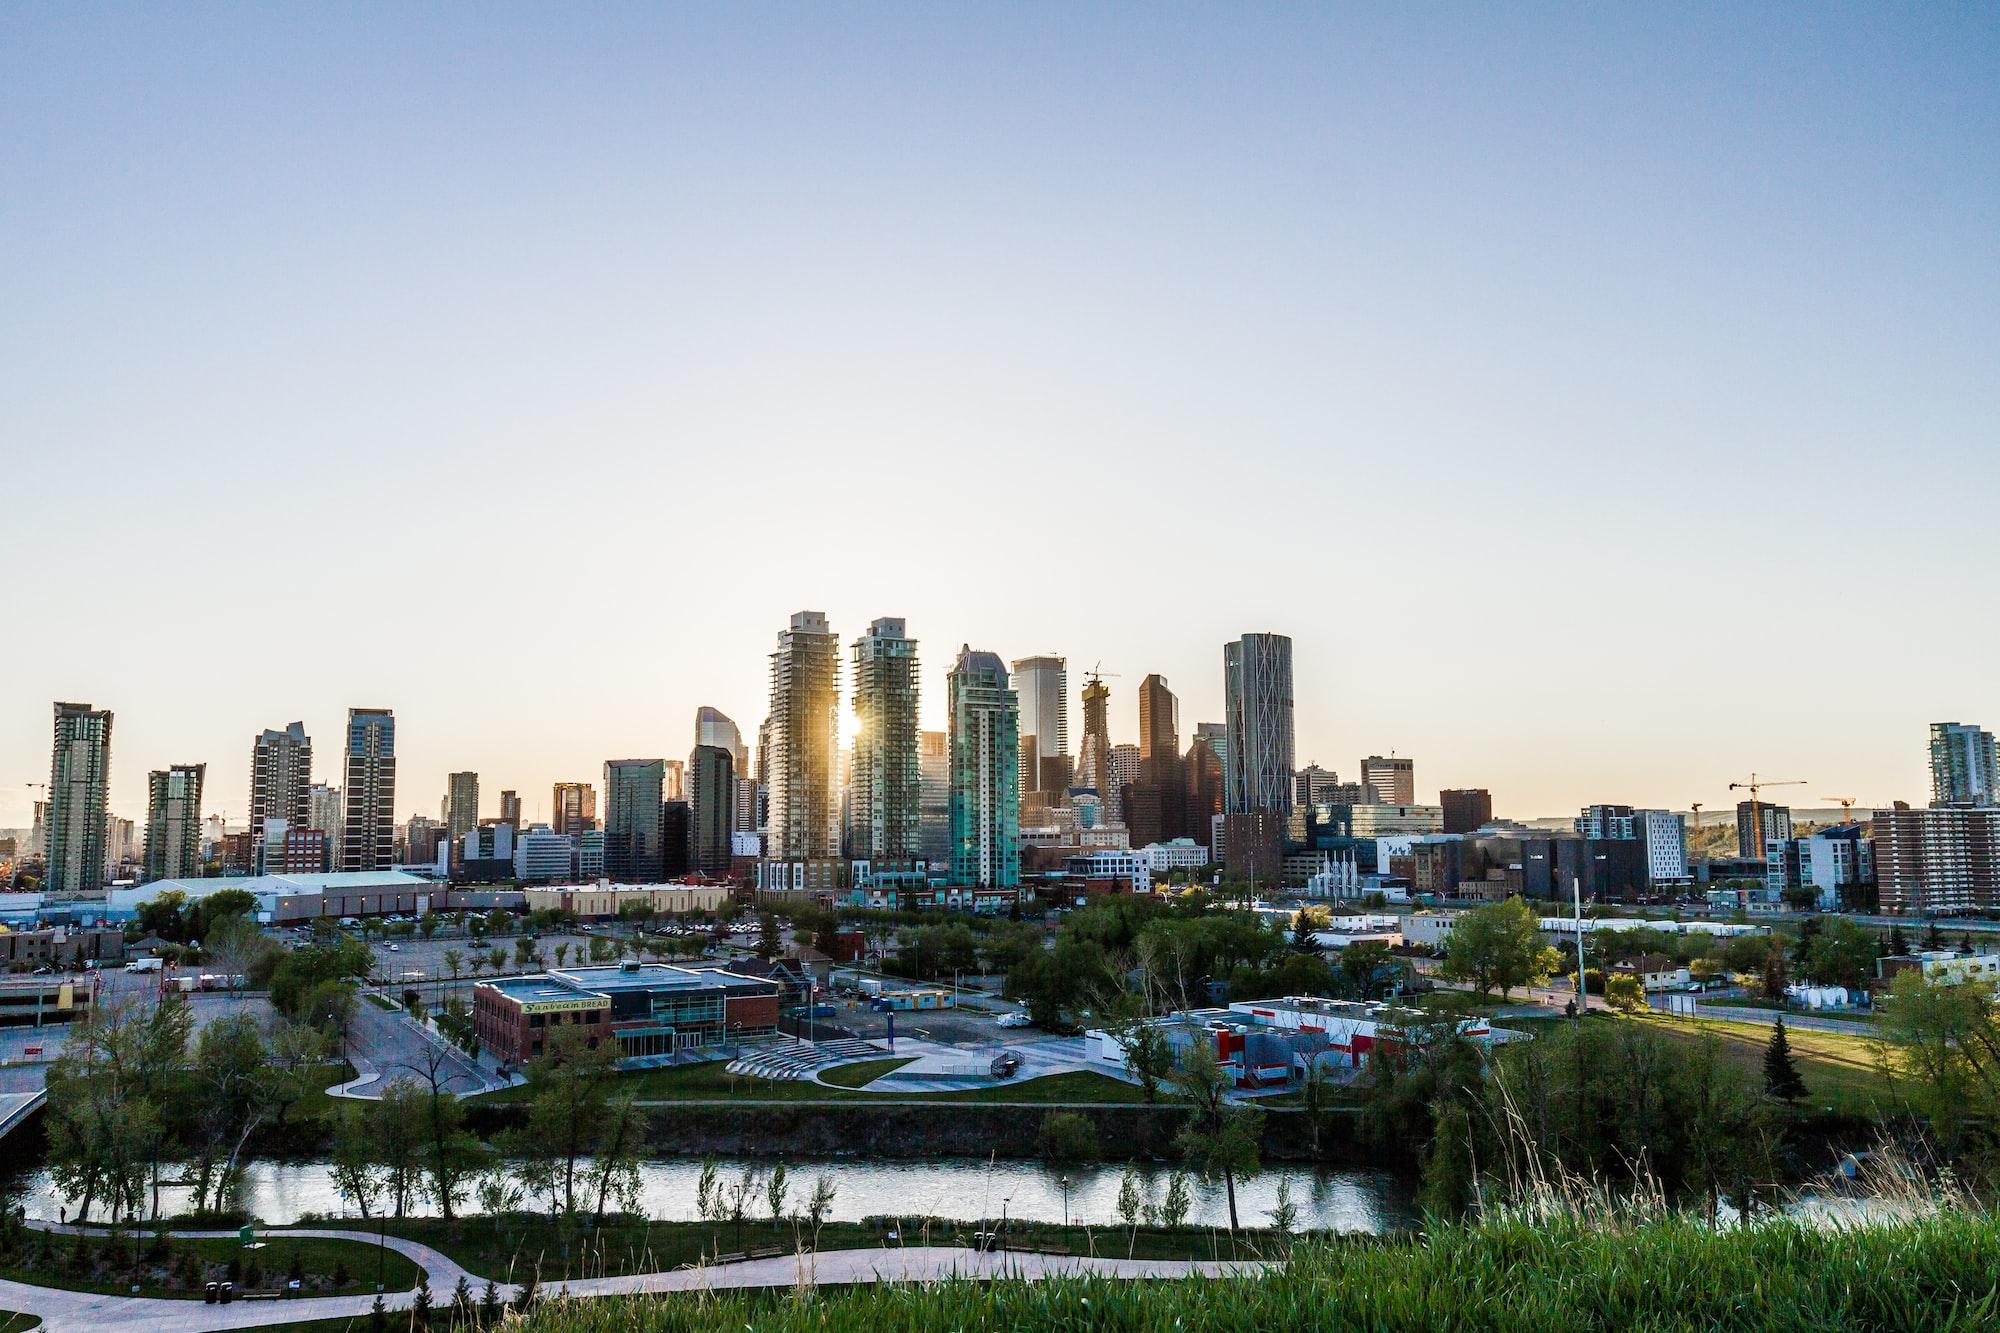 Back to Calgary 🇨🇦